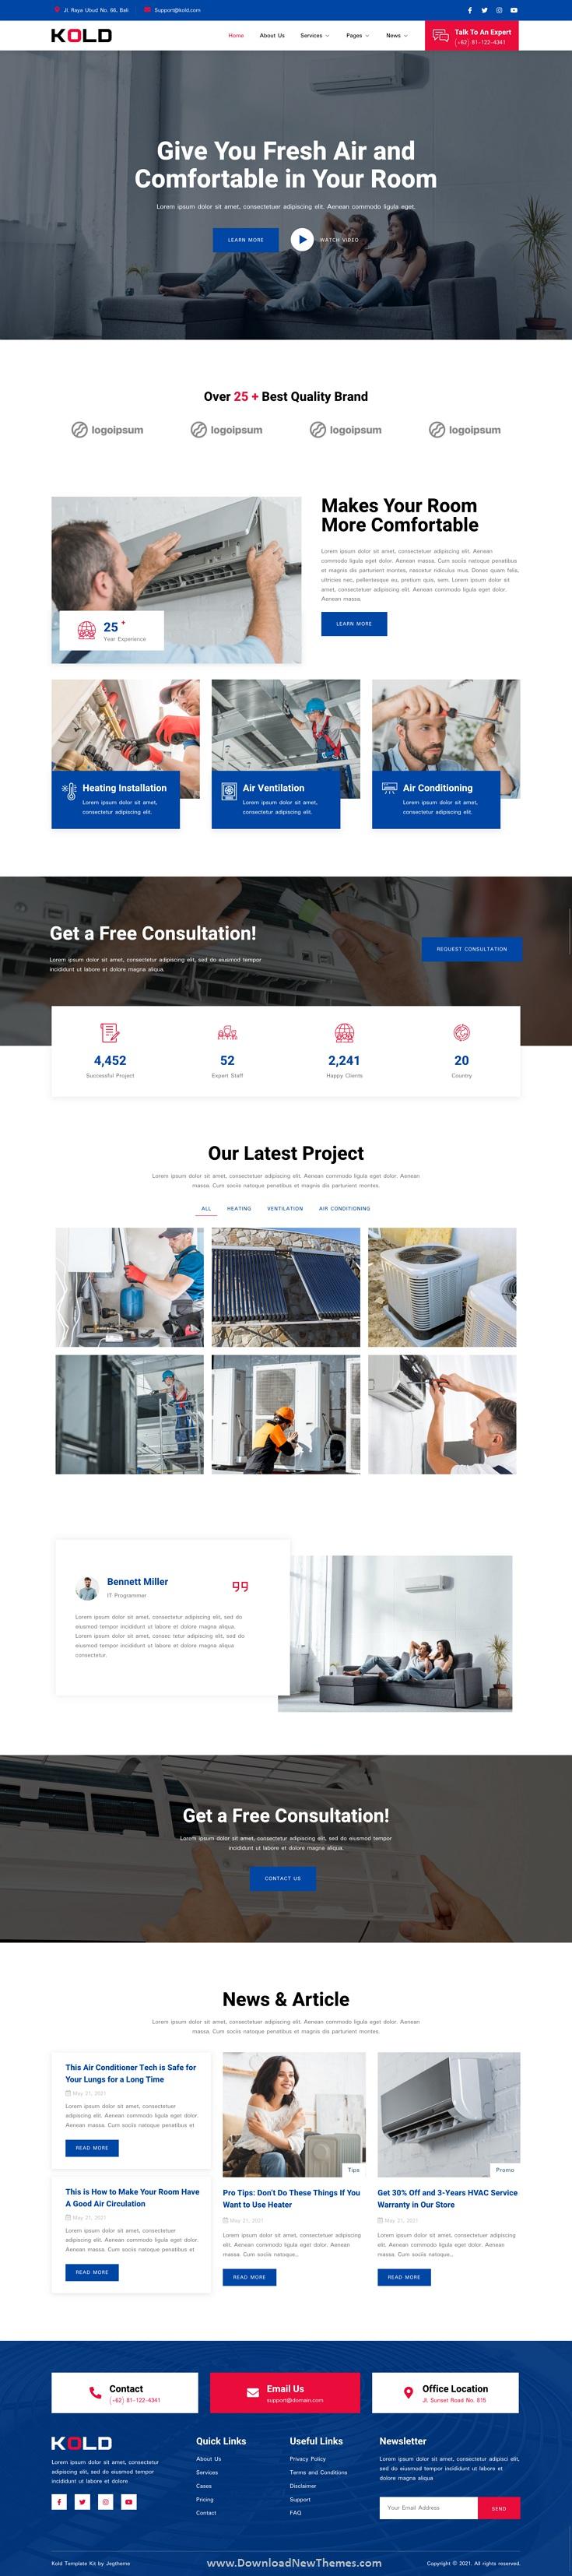 Air Conditioner & HVAC Repair Service Elementor Template Kit